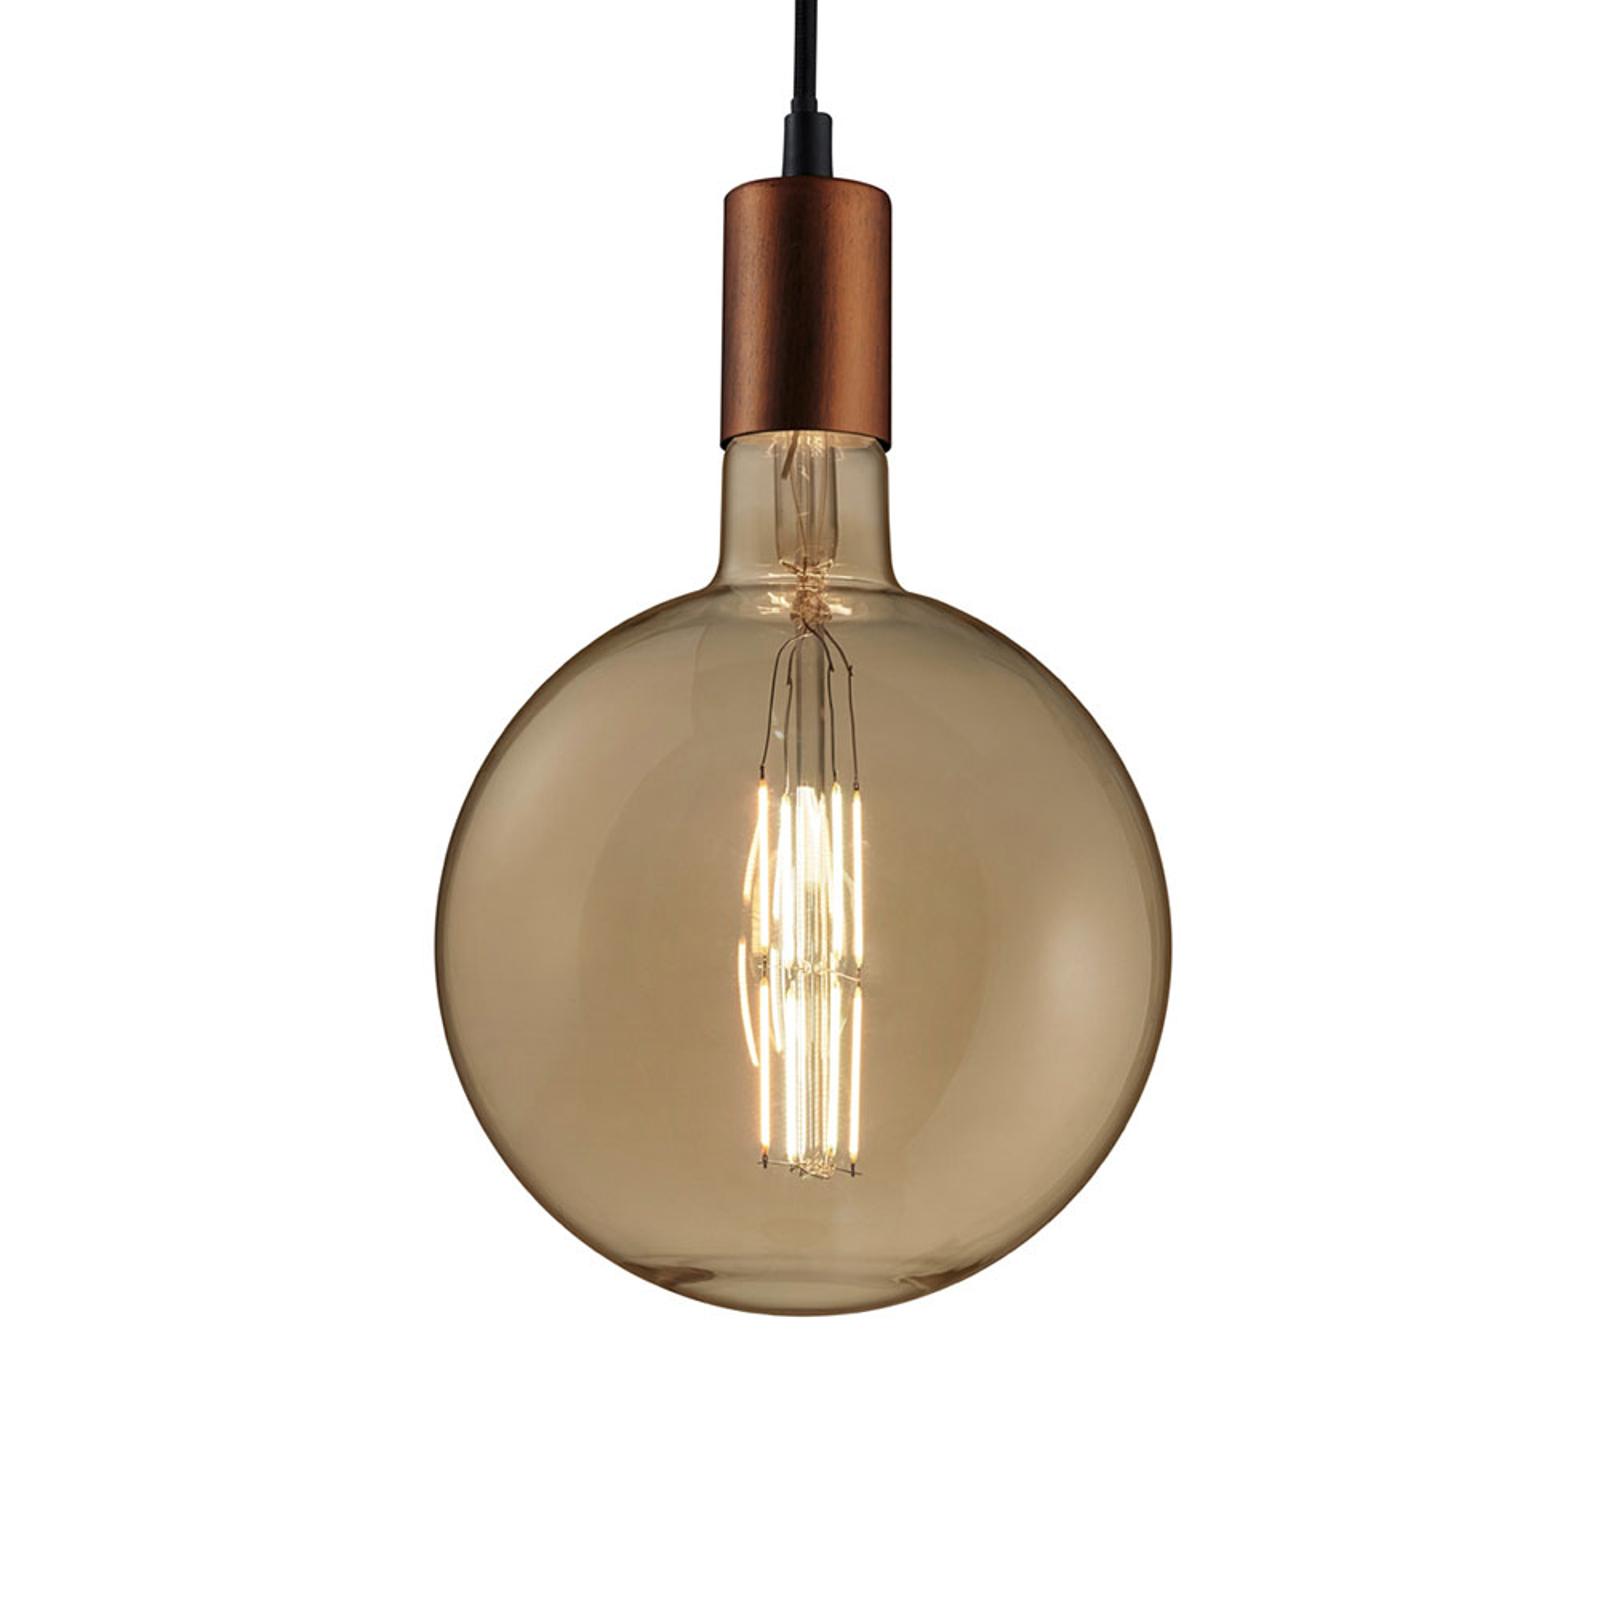 WiZ LED-globlampa E27 6,5 W 650 lm dimbar filament